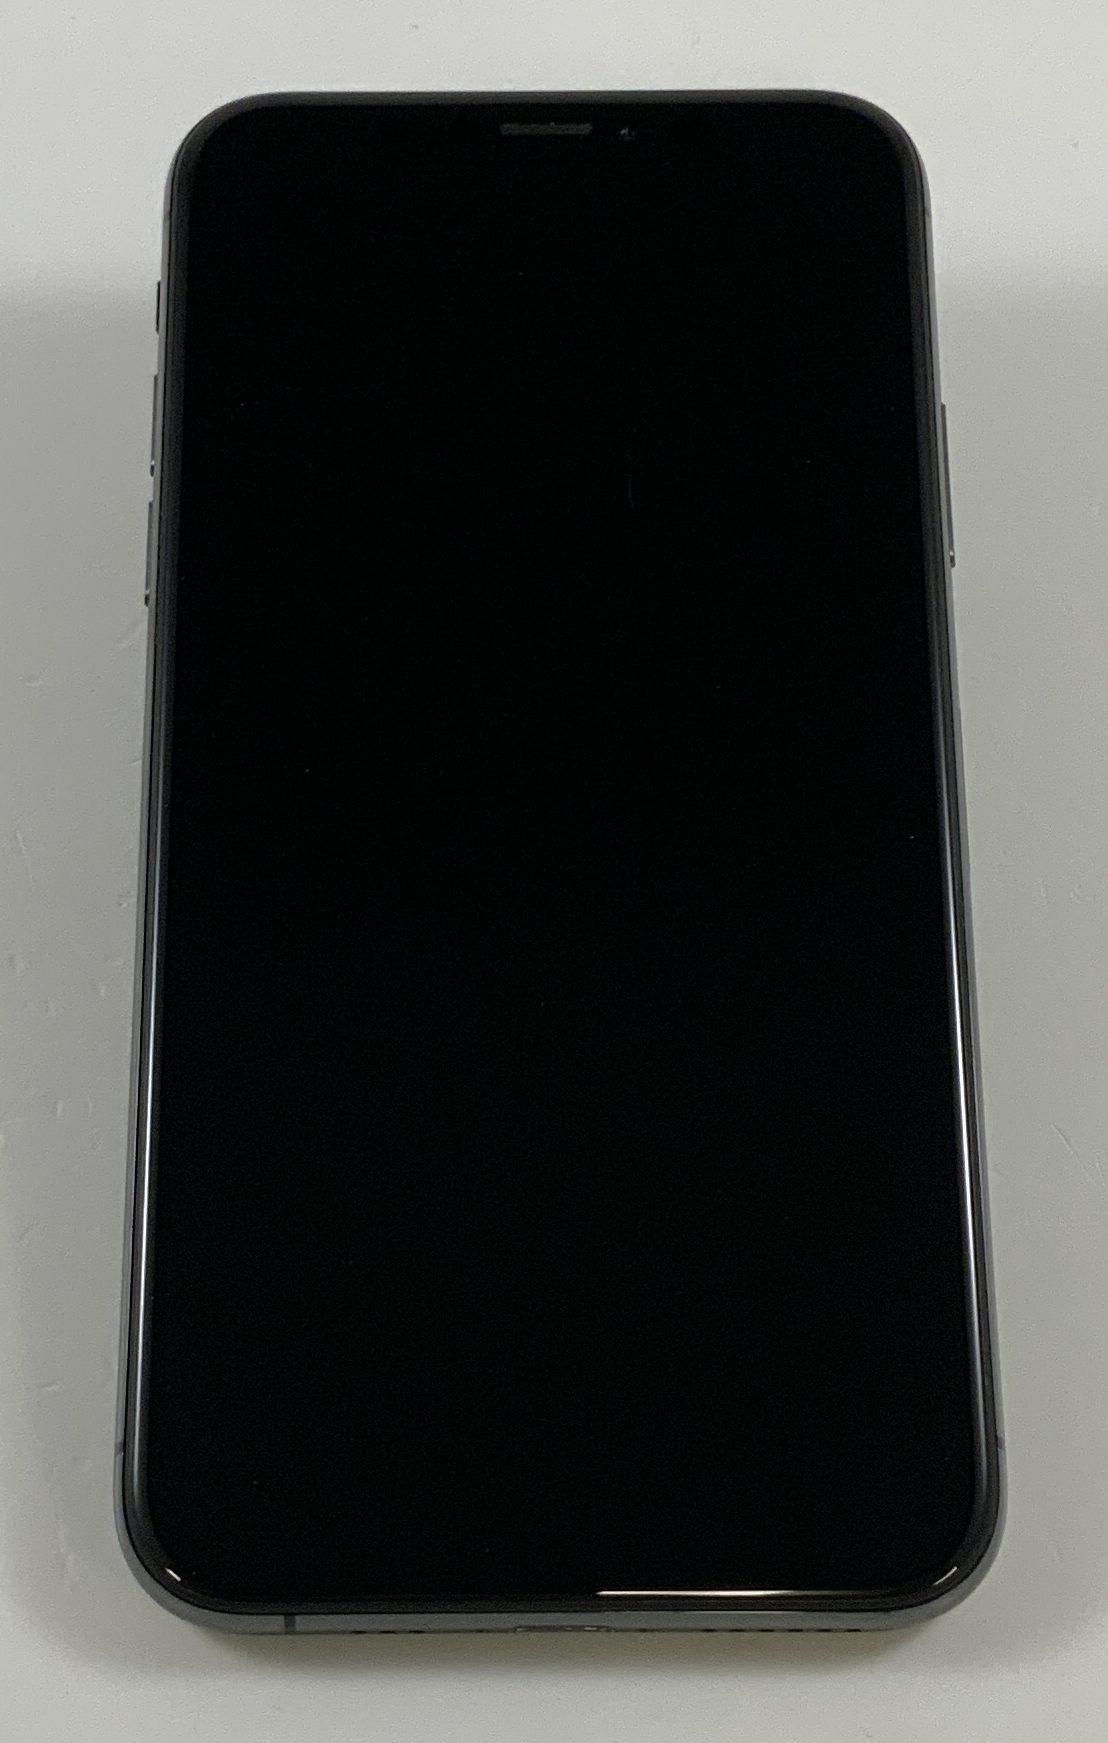 iPhone XS 64GB, 64GB, Space Gray, immagine 1